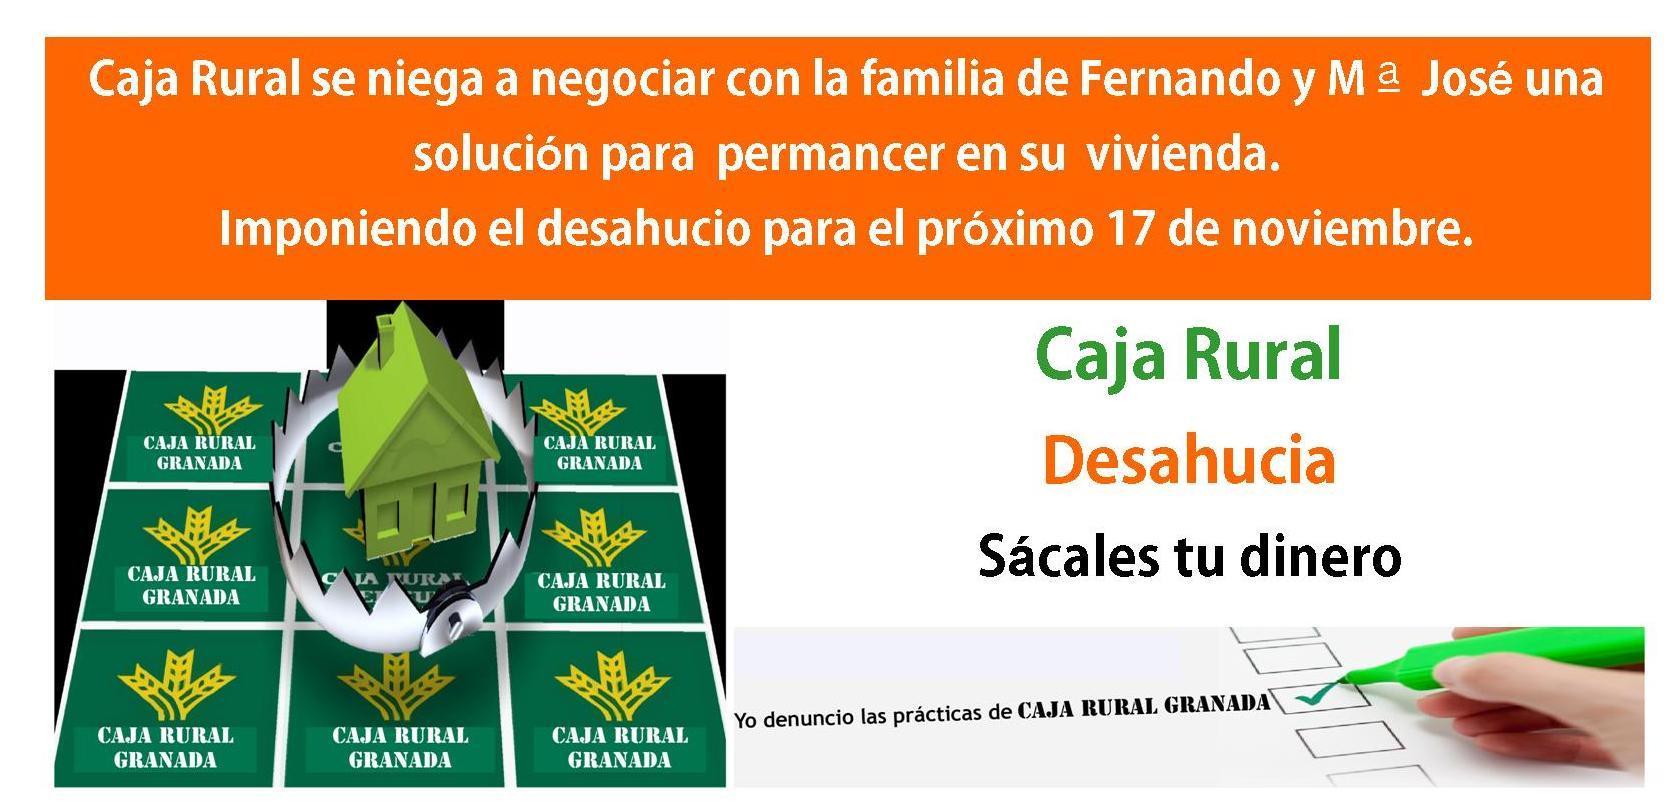 Caja Rural de Granada desahucia